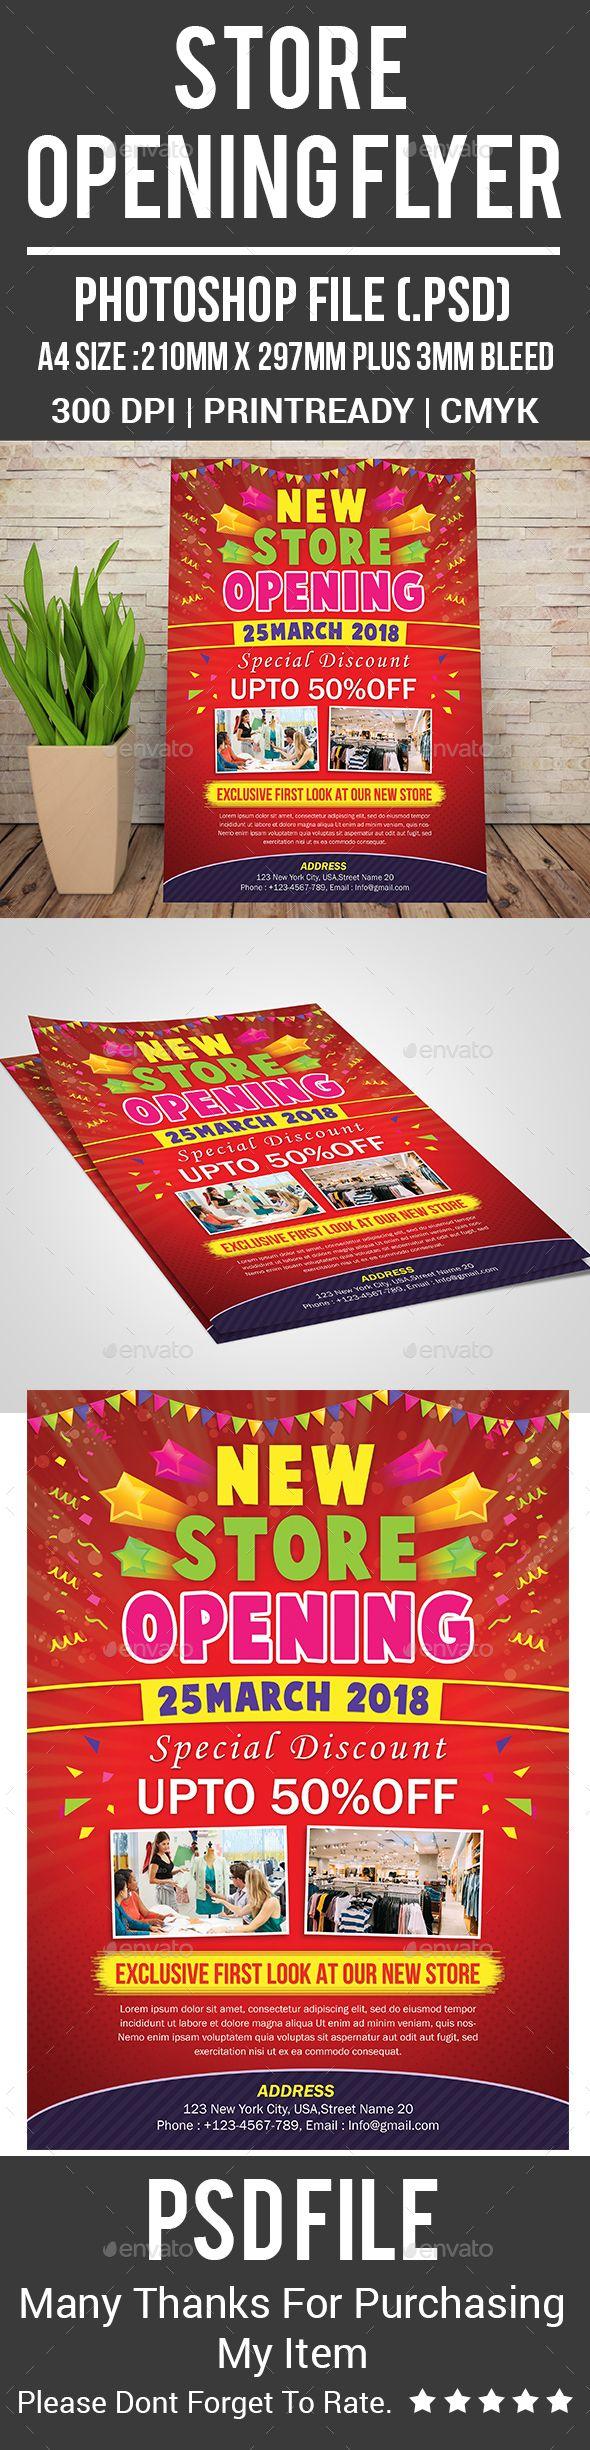 Store Opening Flyer Corporate Flyers Flyer Pinterest Flyer